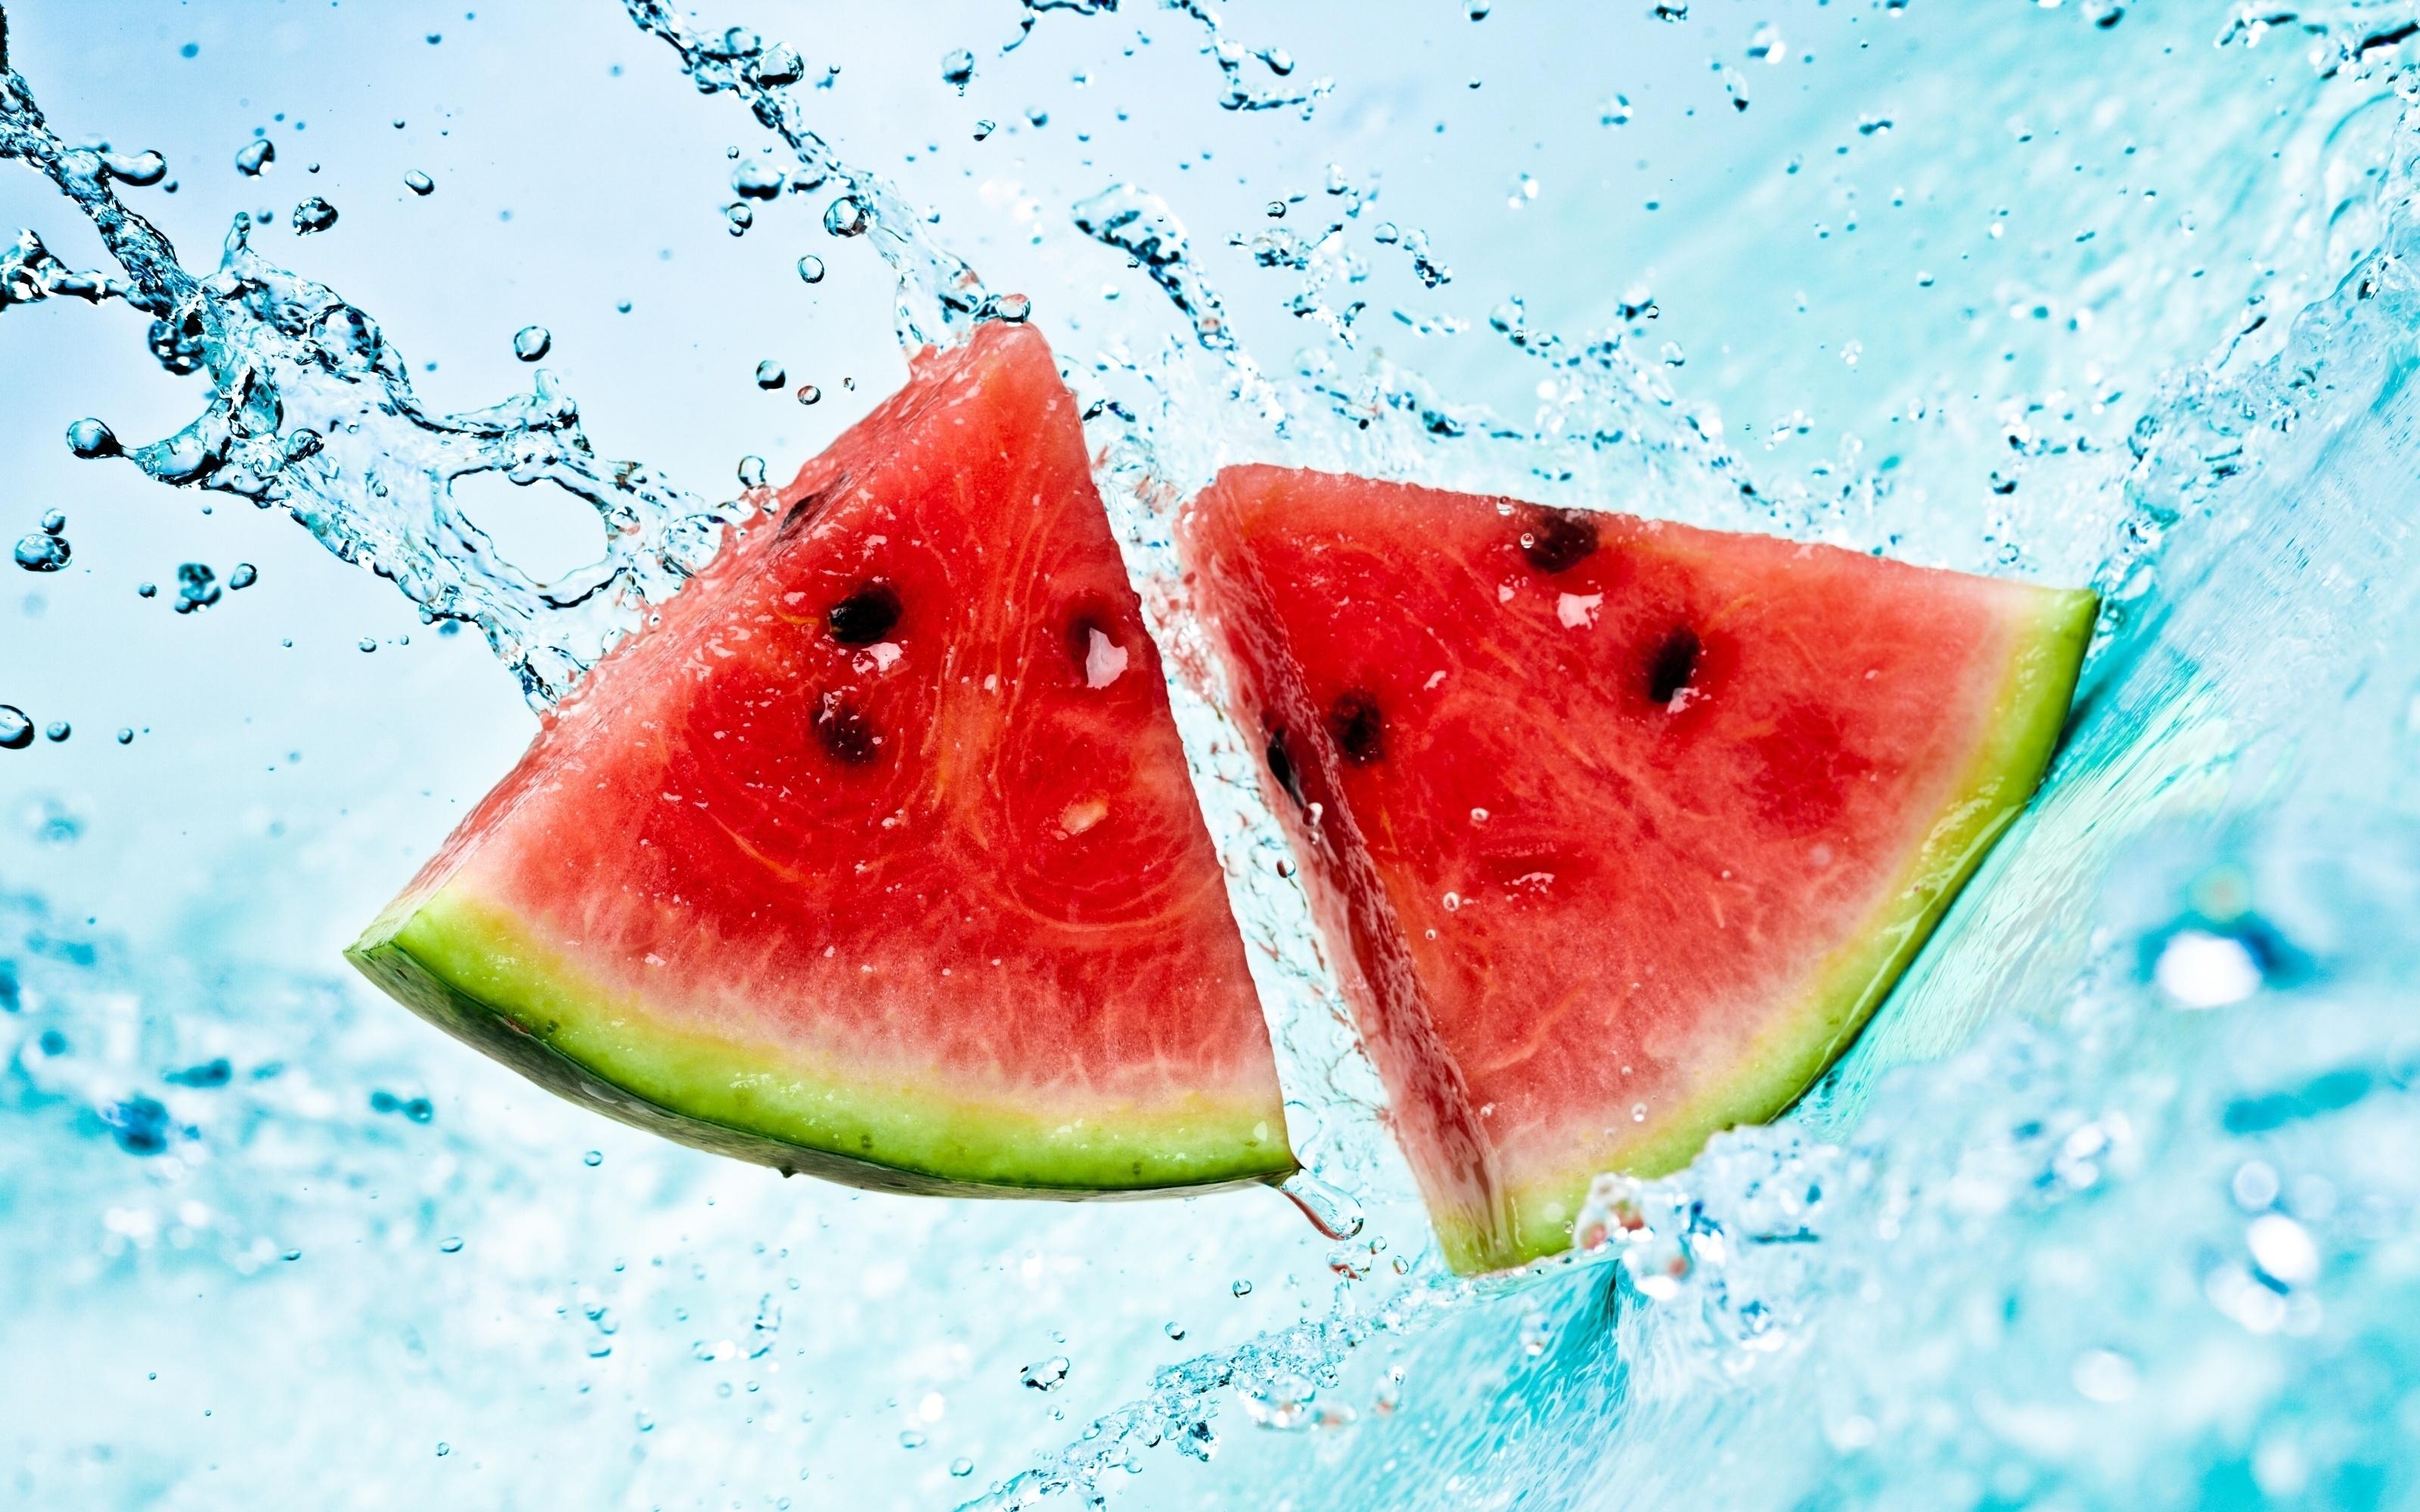 free watermelon wallpaper 32246